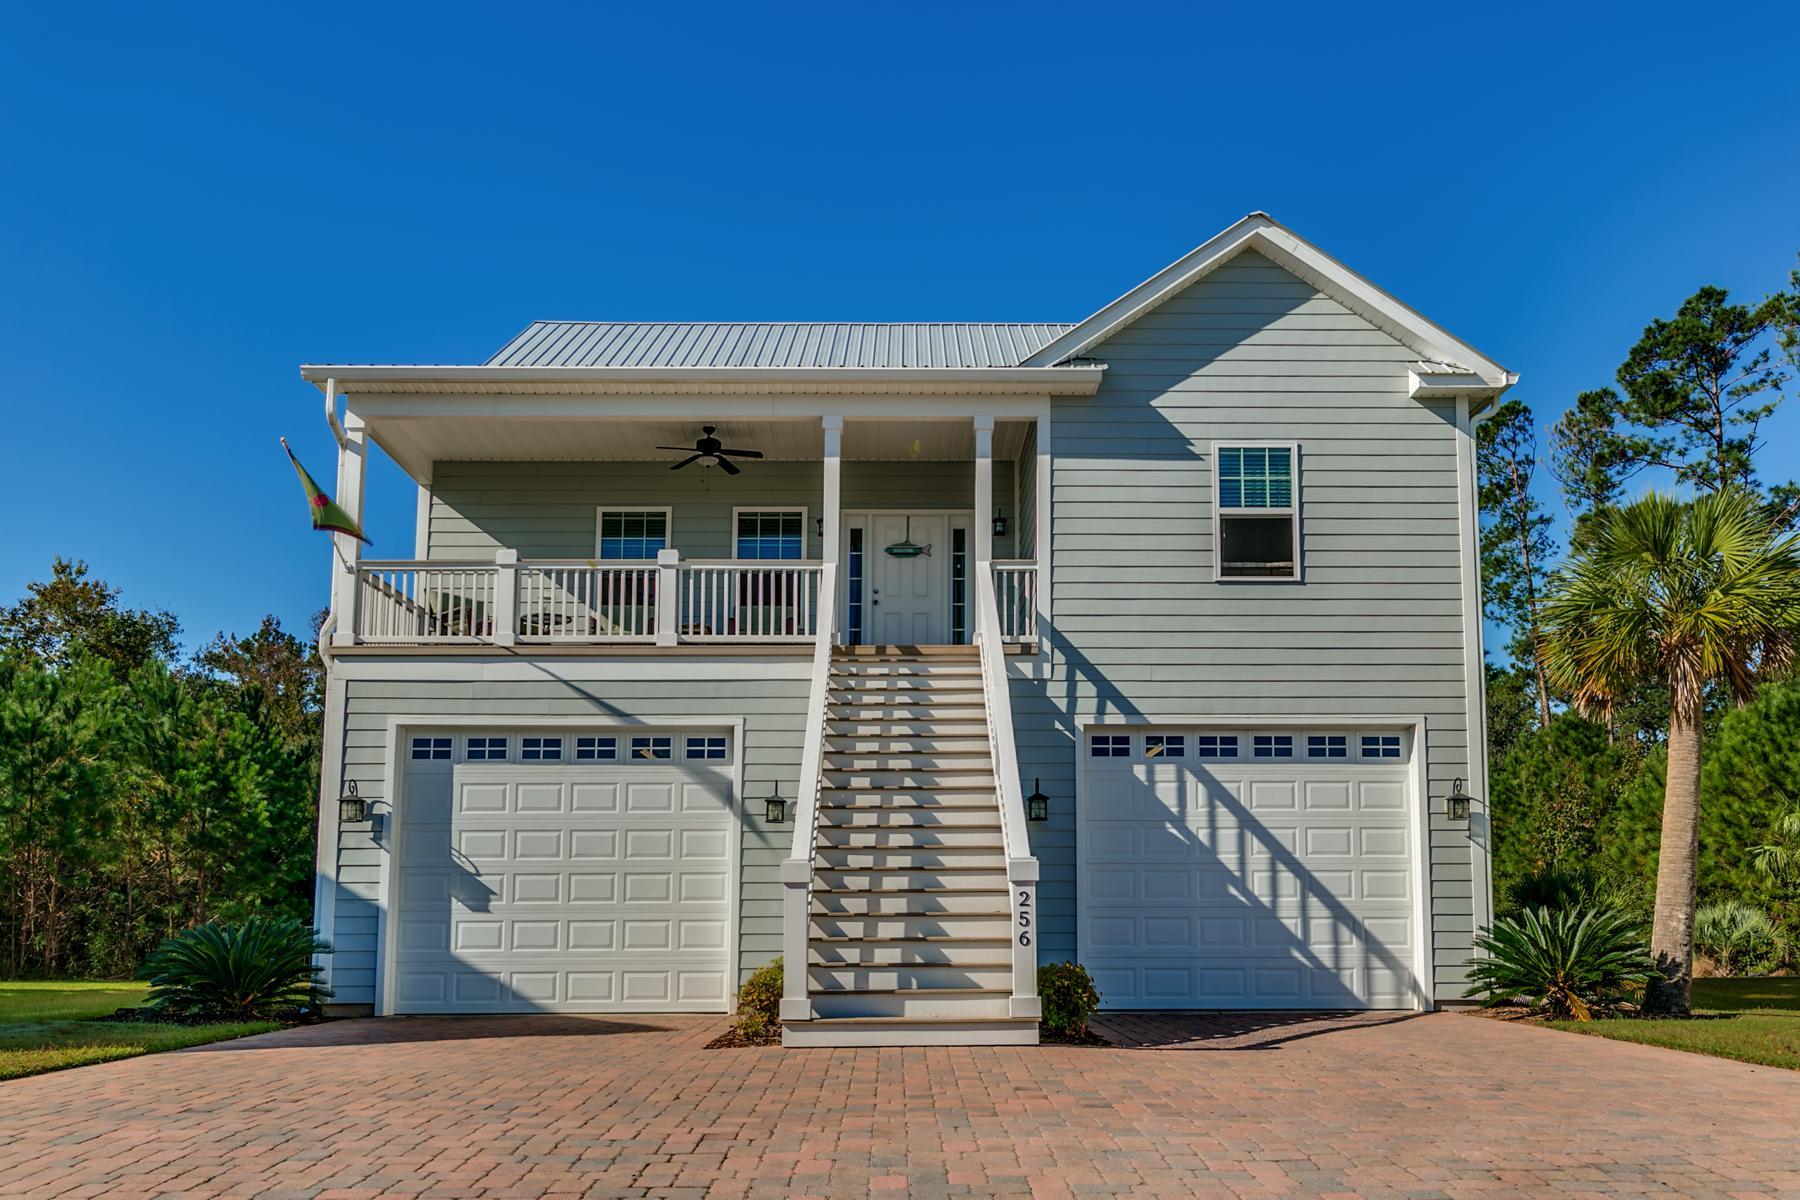 Villa per Vendita alle ore 256 Graytwig Circle Murrells Inlet, Carolina Del Sud, 29576 Stati Uniti